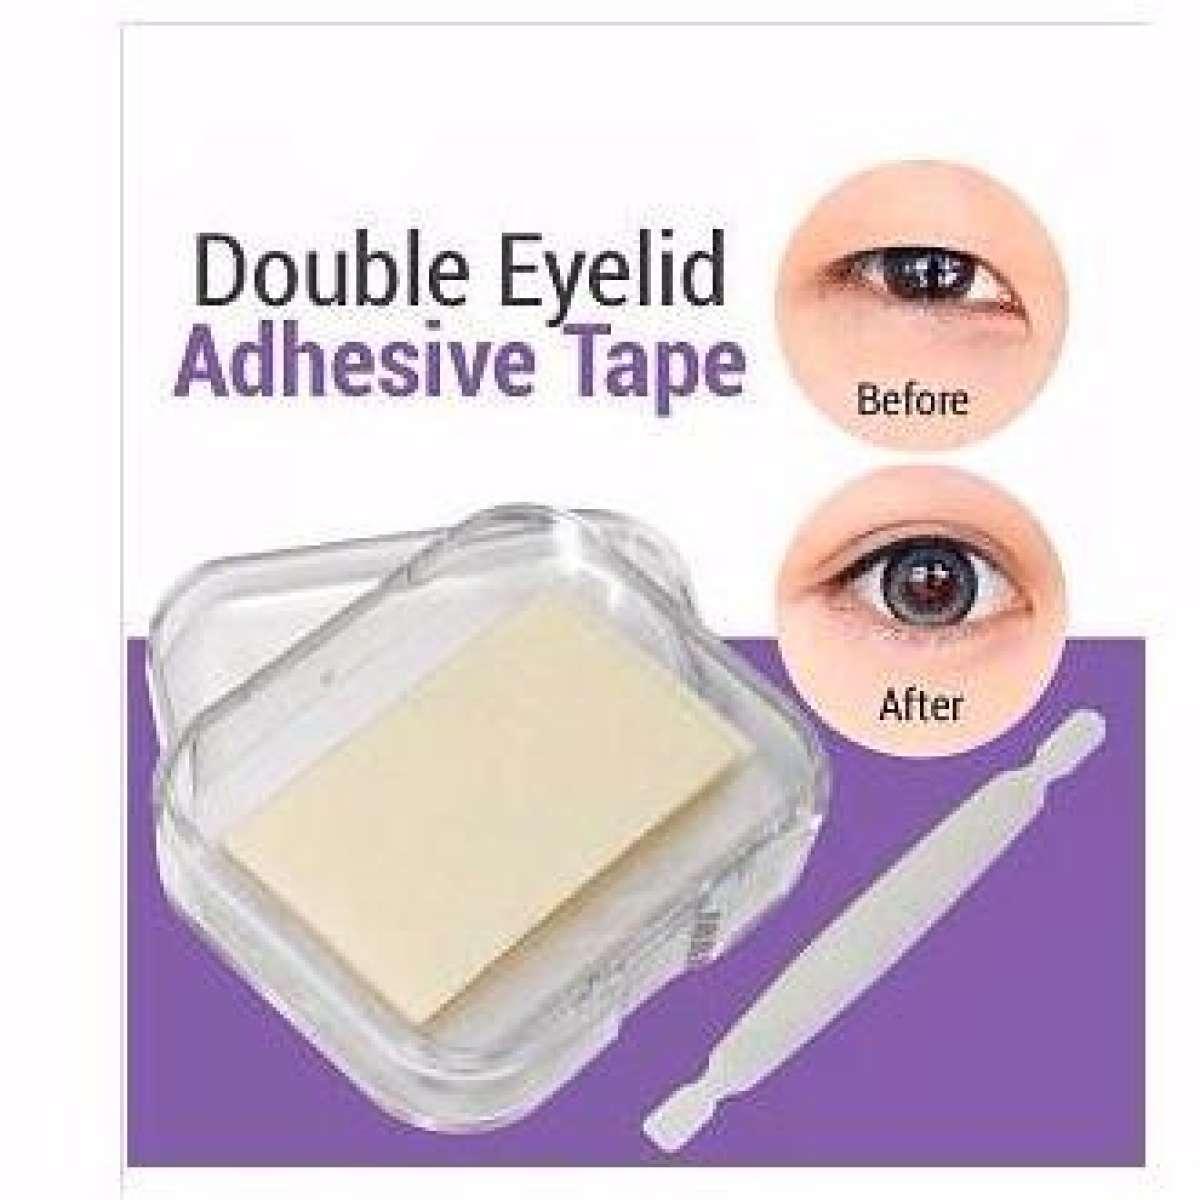 Primestore Double Eyelid Adhesive Tape Philippines